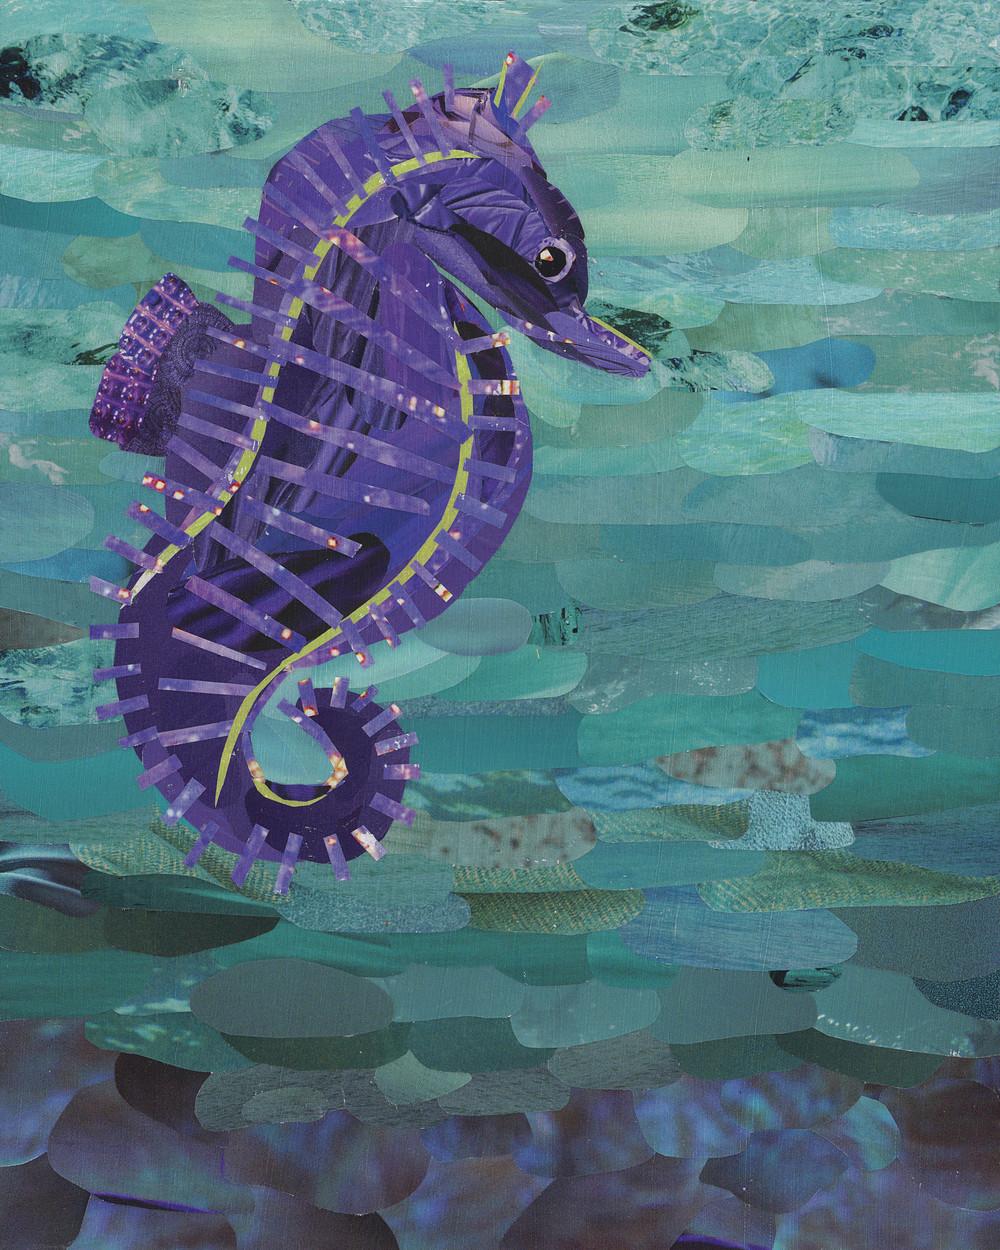 Mattie the Seahorse